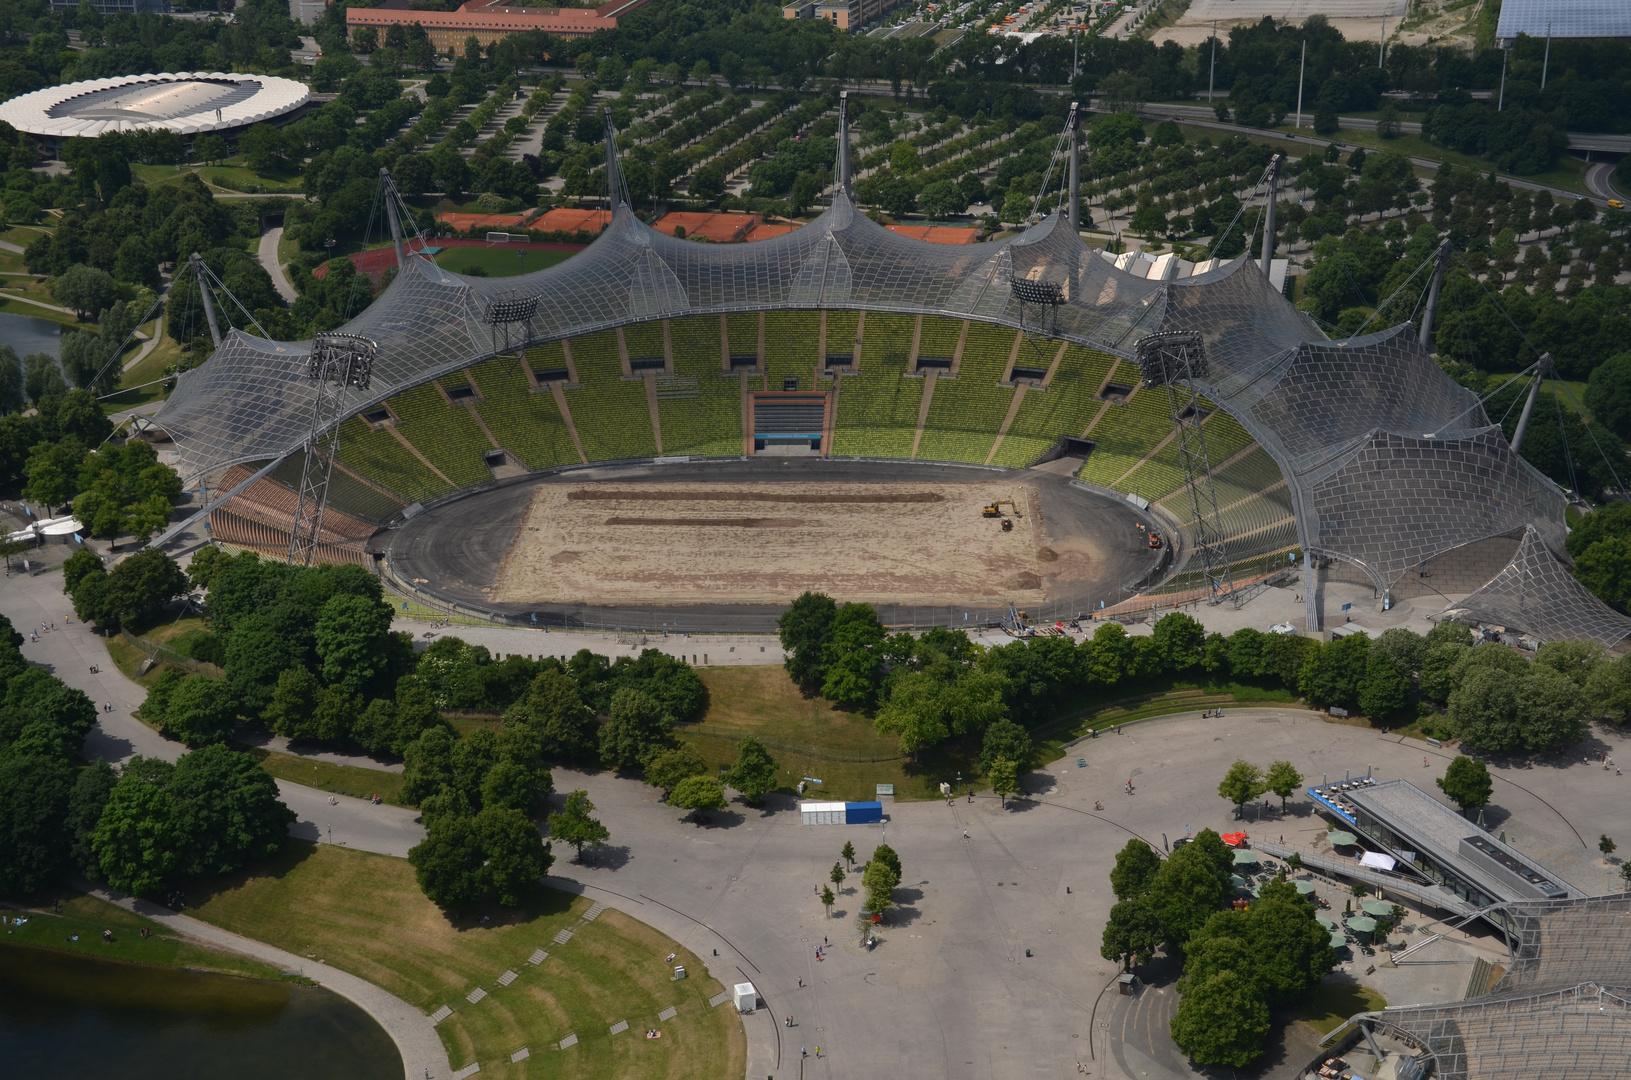 Olympiastadion vom Olympiaturm aus.